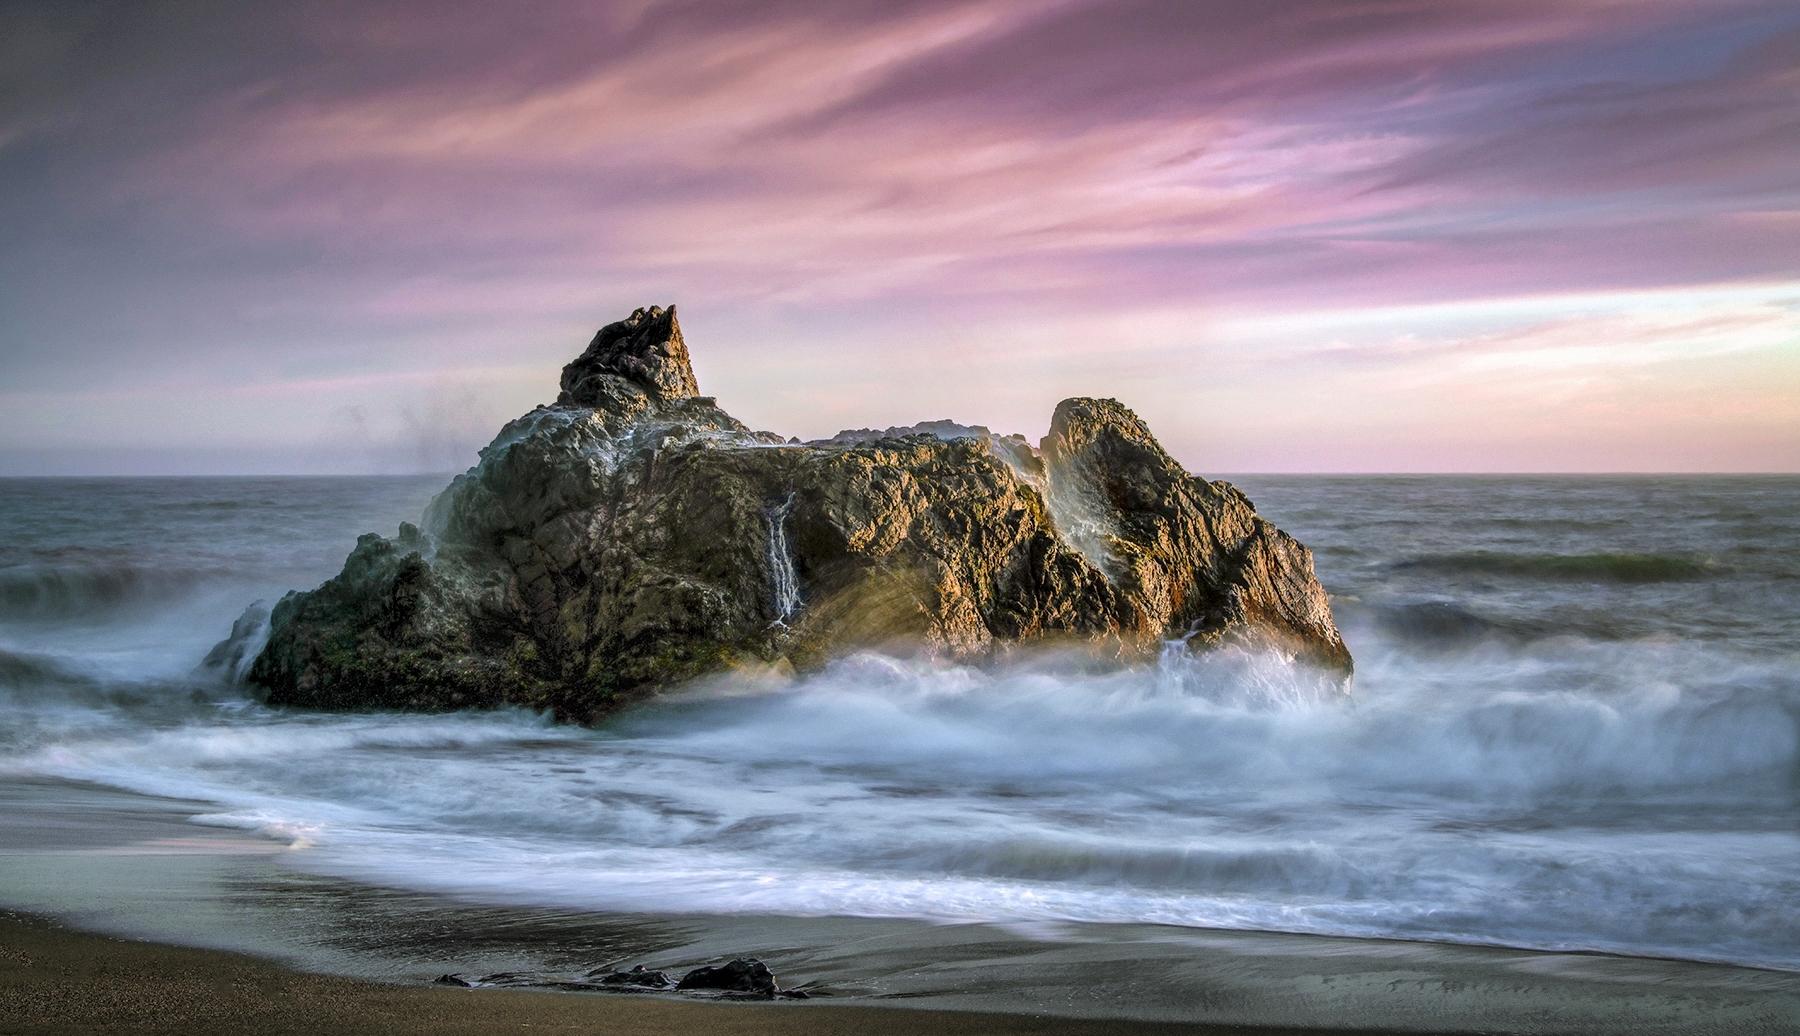 Sonoma-coast-PB-1-Place-by-DJ-Leland-MR